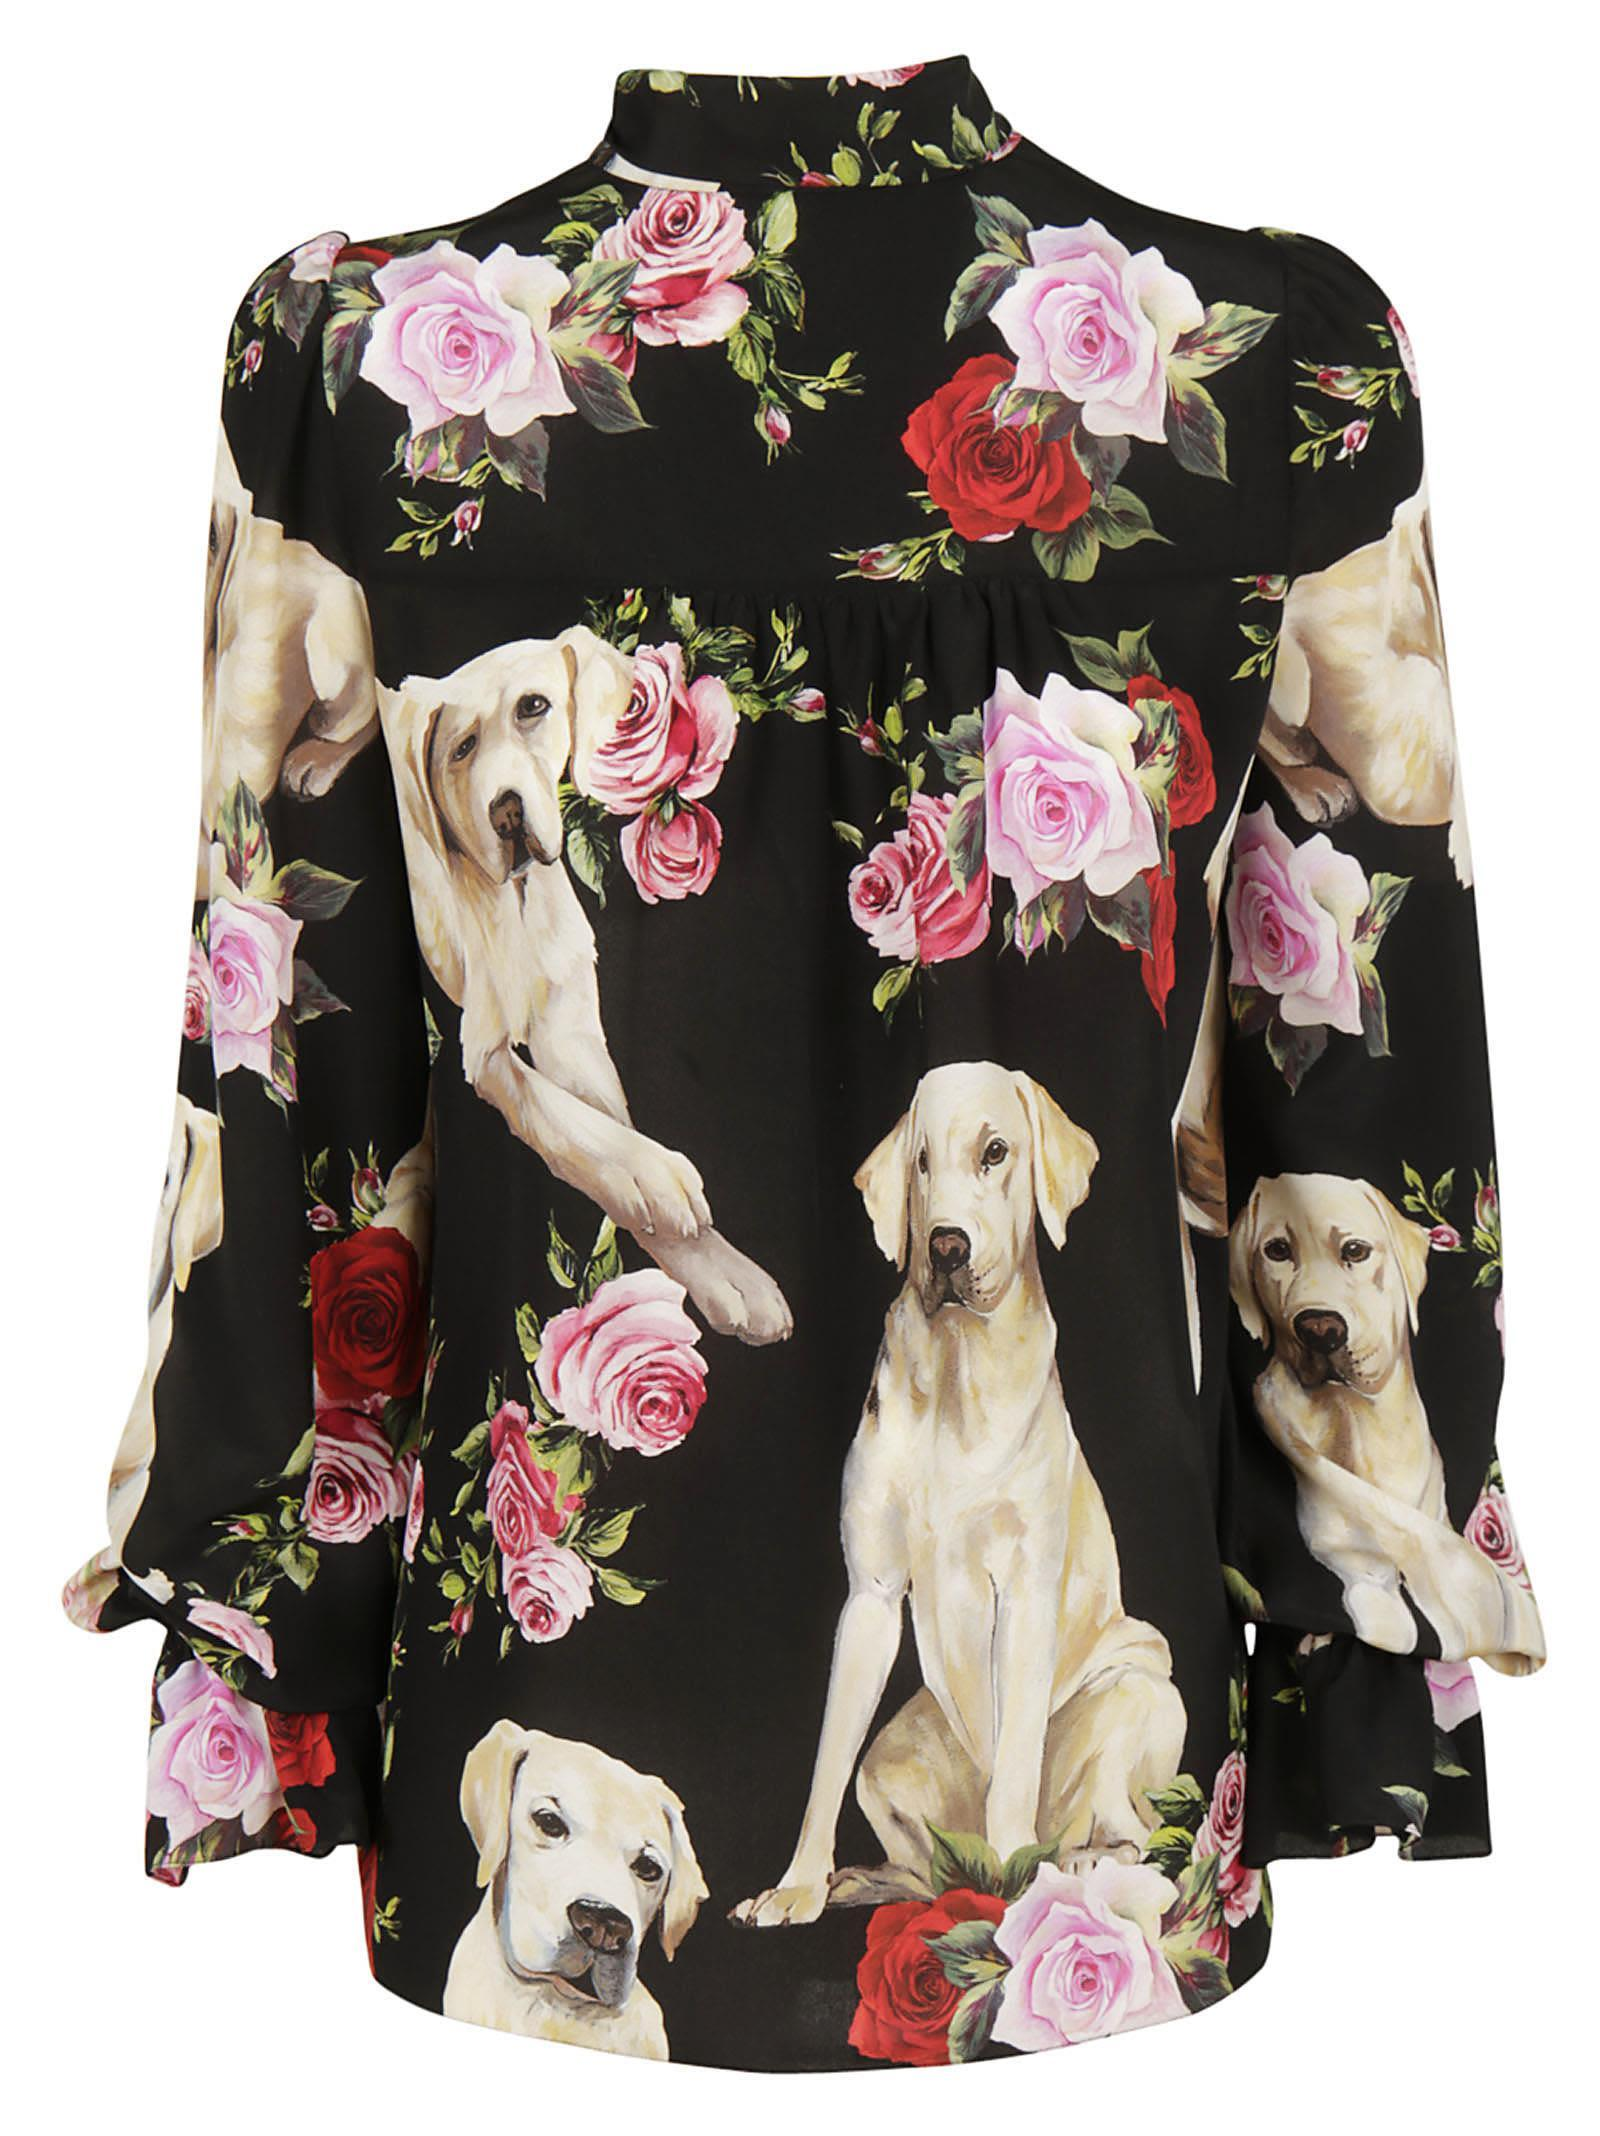 ccd3452b Dolce & Gabbana Floral & Golden Retriever Silk Tie-Neck Blouse, Black In  Black